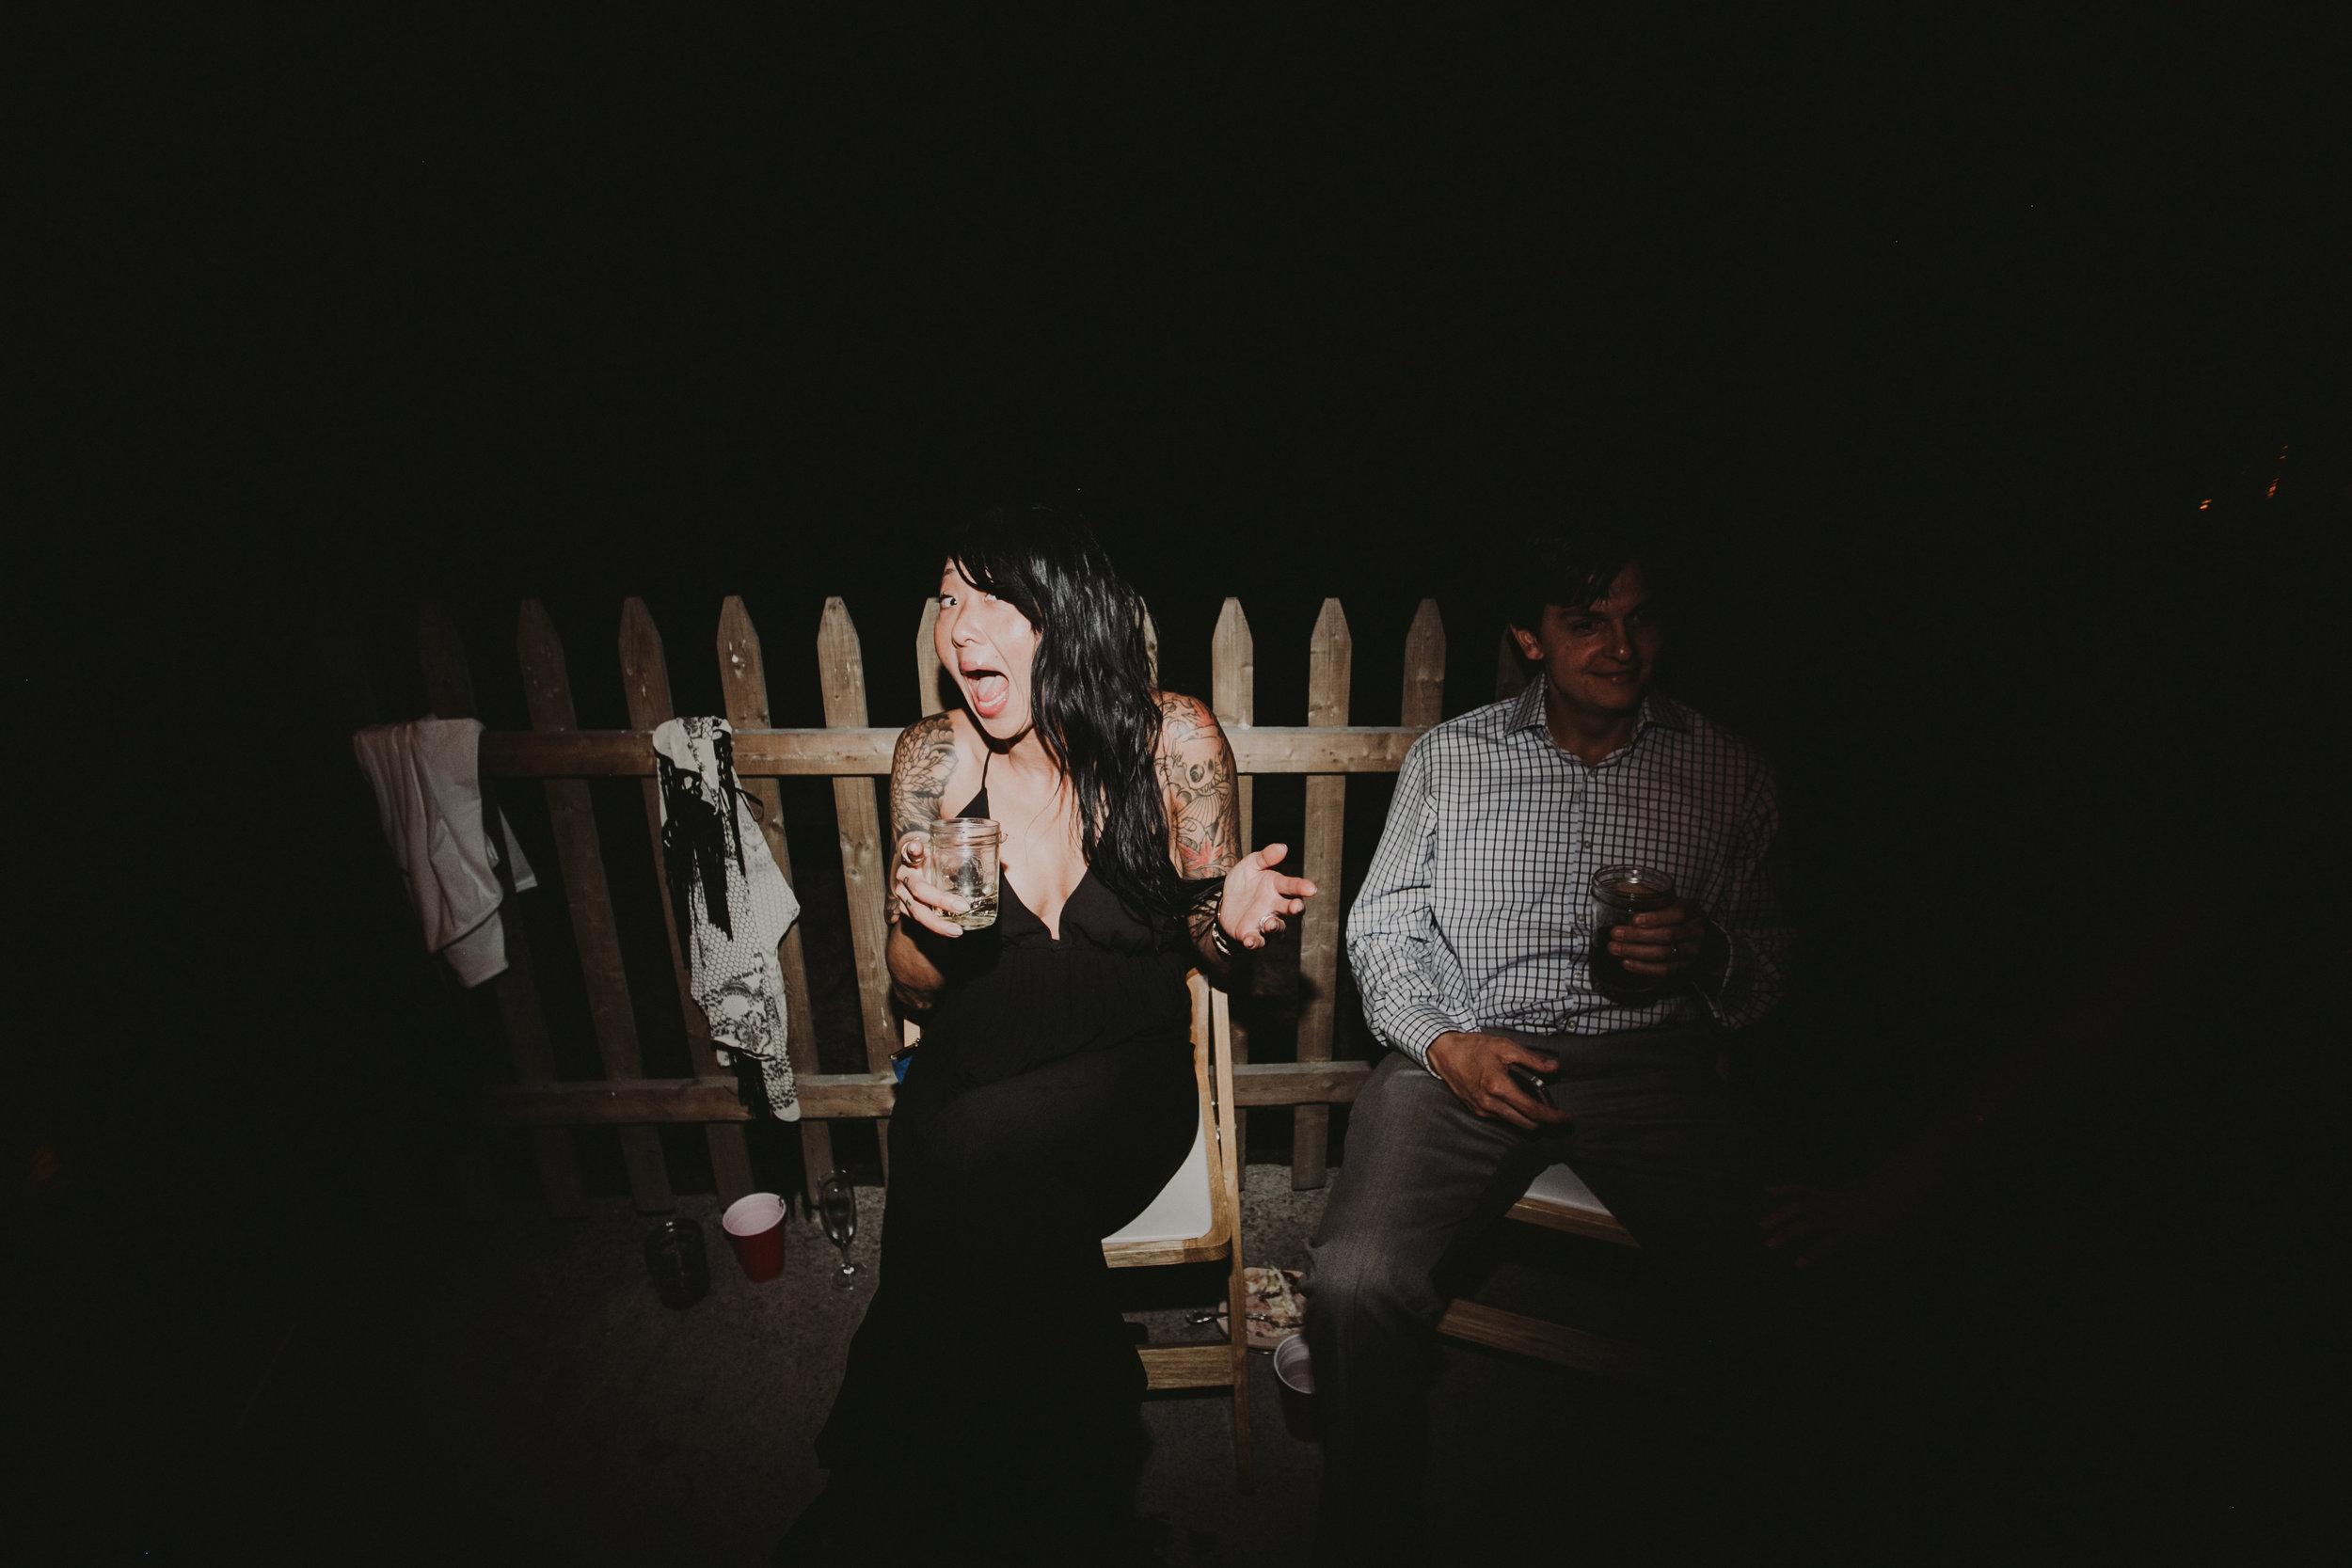 LIBERTY_VIEW_FARM_HIGHLAND_NY_WEDDING_CHELLISE_MICHAEL_PHOTOGRAPHY905.JPG